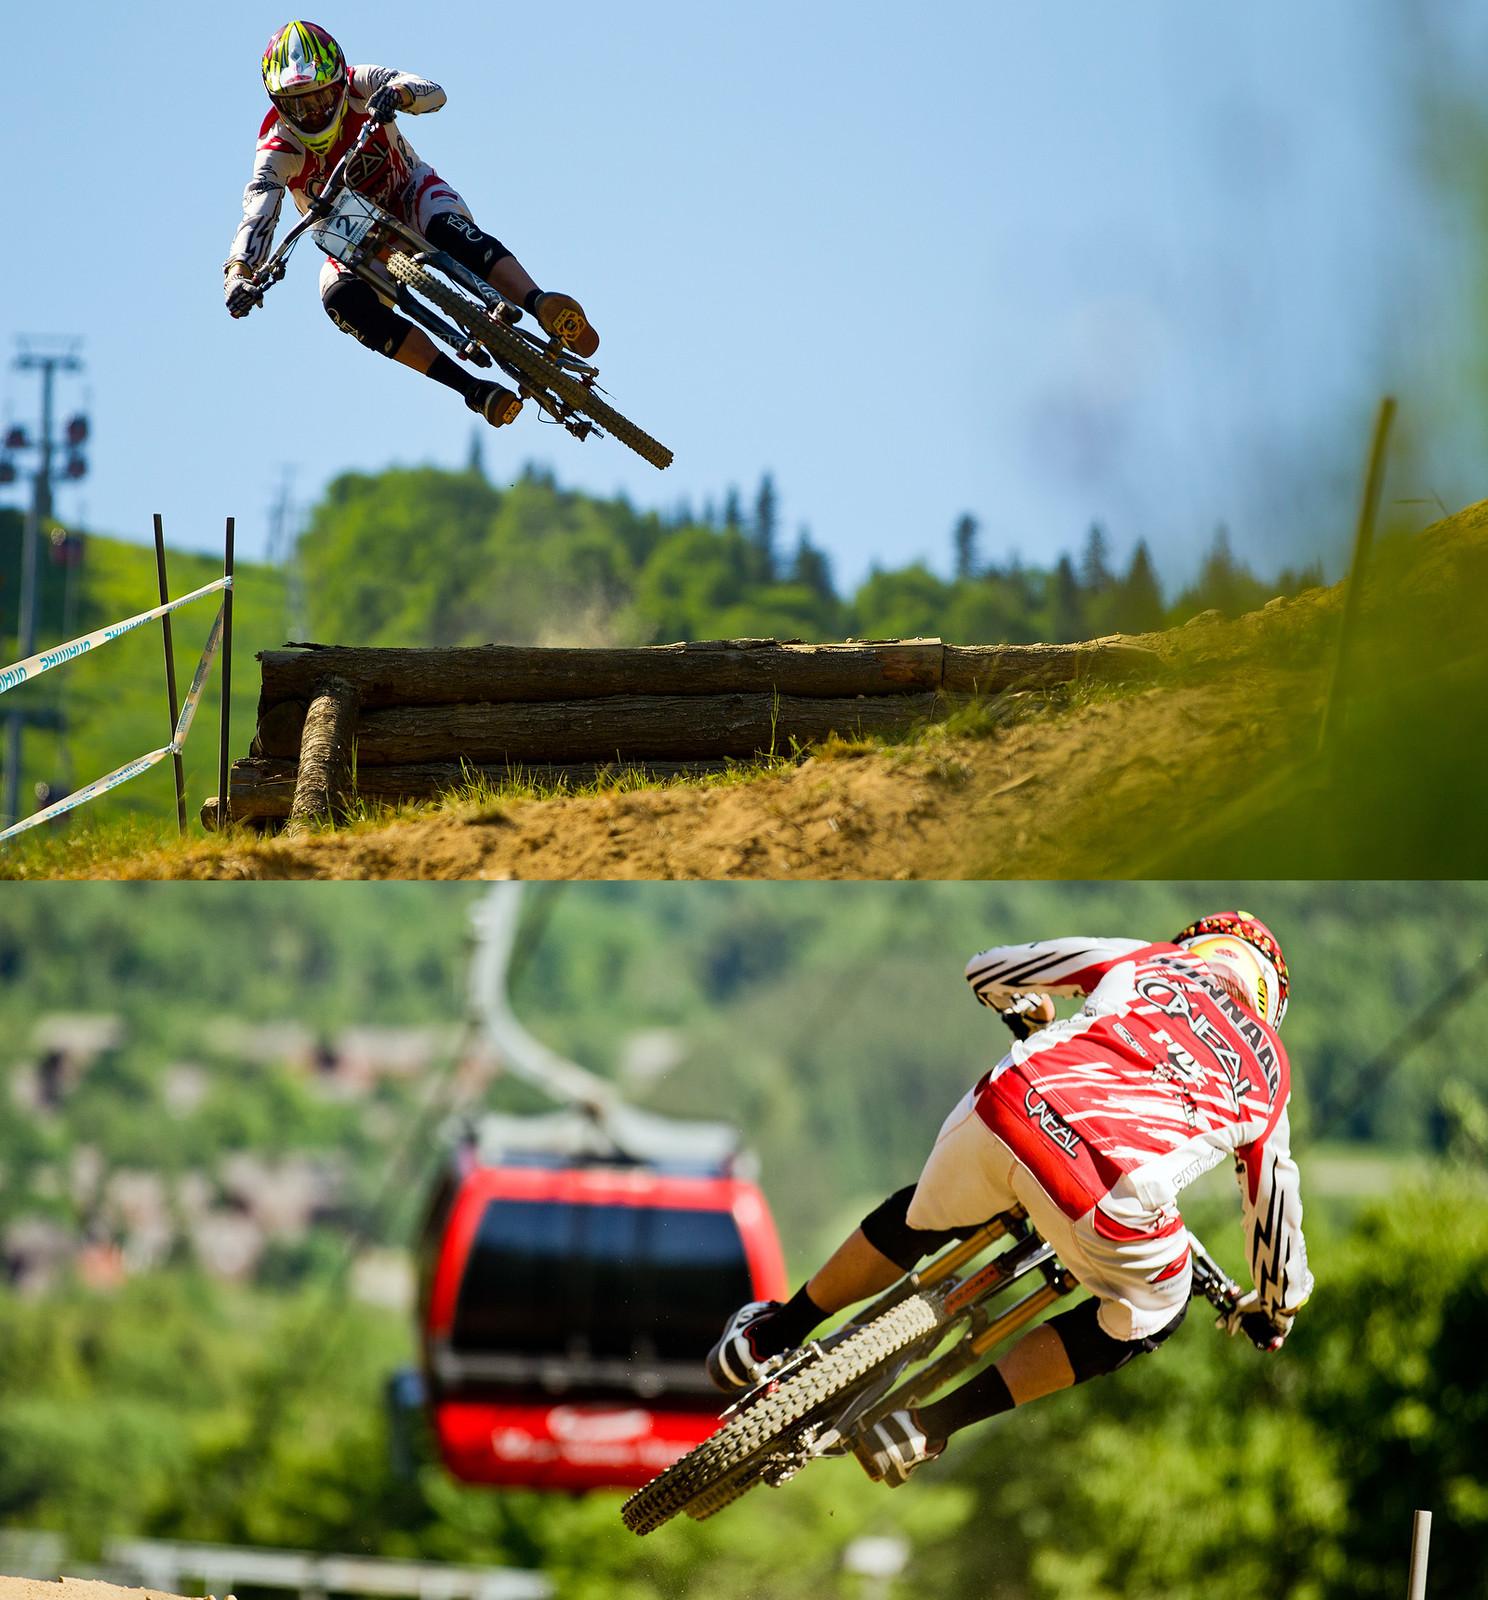 Greg Minnaar Perfect Form at Mont Sainte Anne - 2012 UCI World Cup, Mont Sainte Anne, Day 2 - Mountain Biking Pictures - Vital MTB